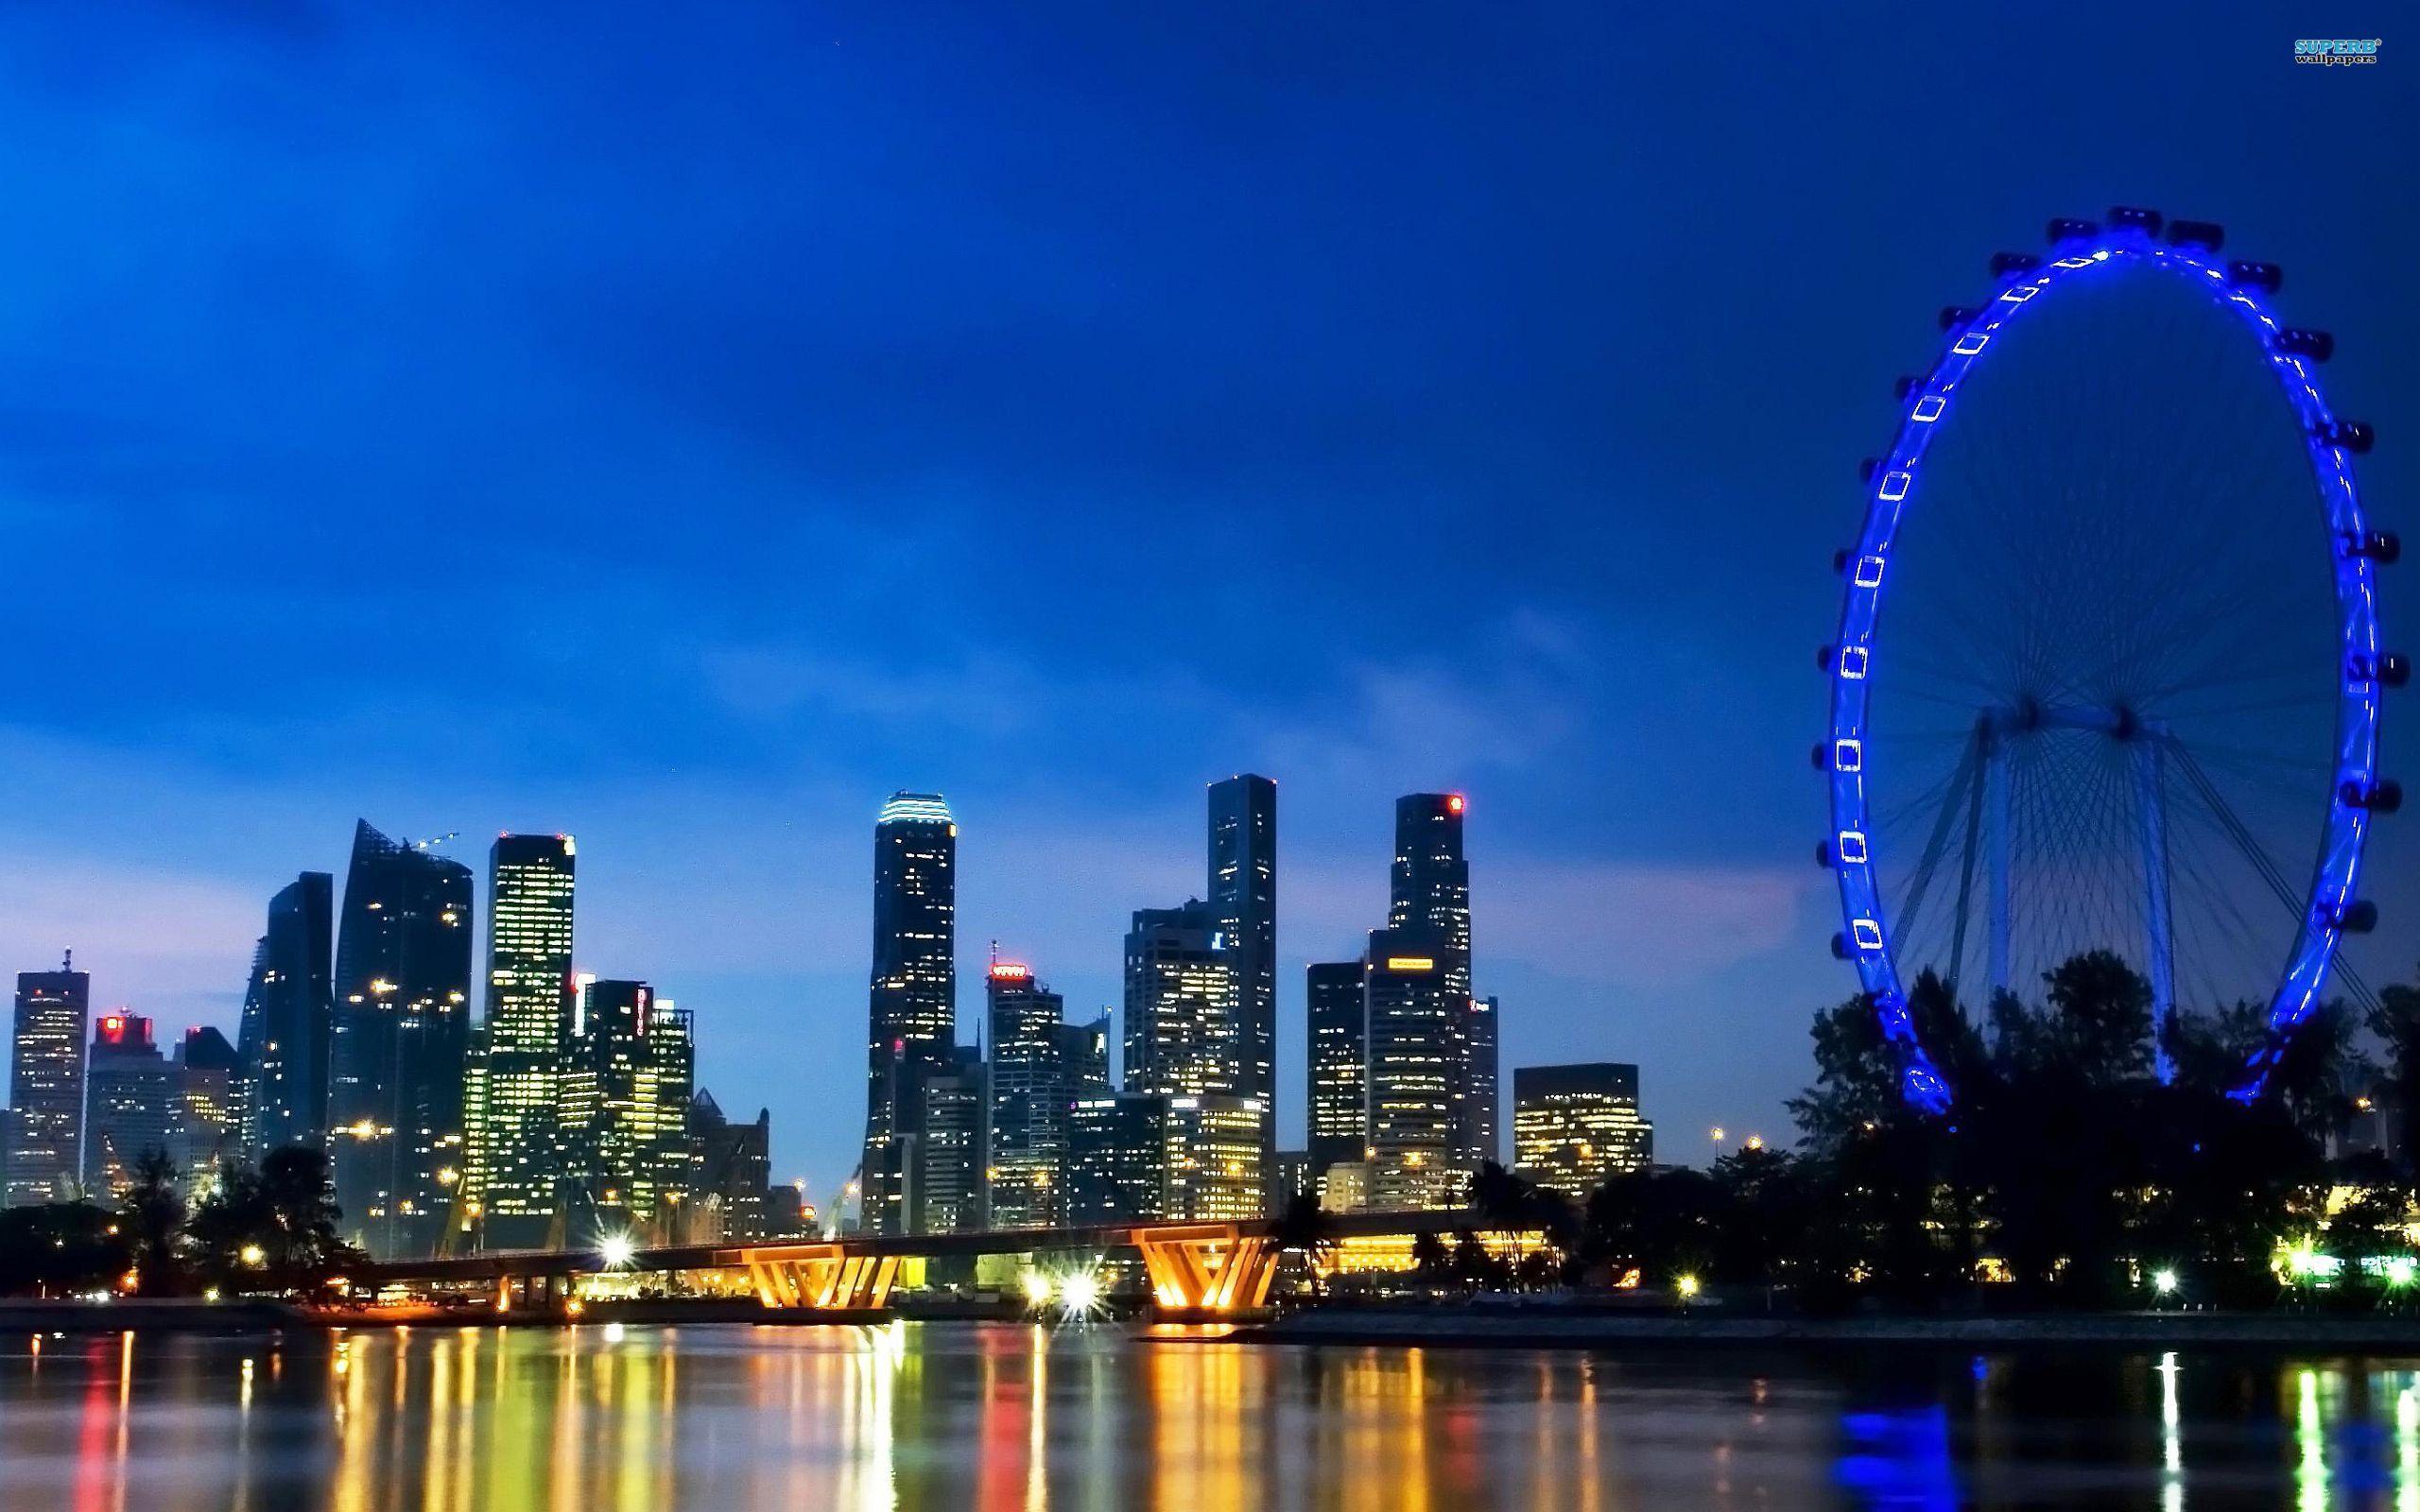 Singapore wallpaper 2560x1600 jpg